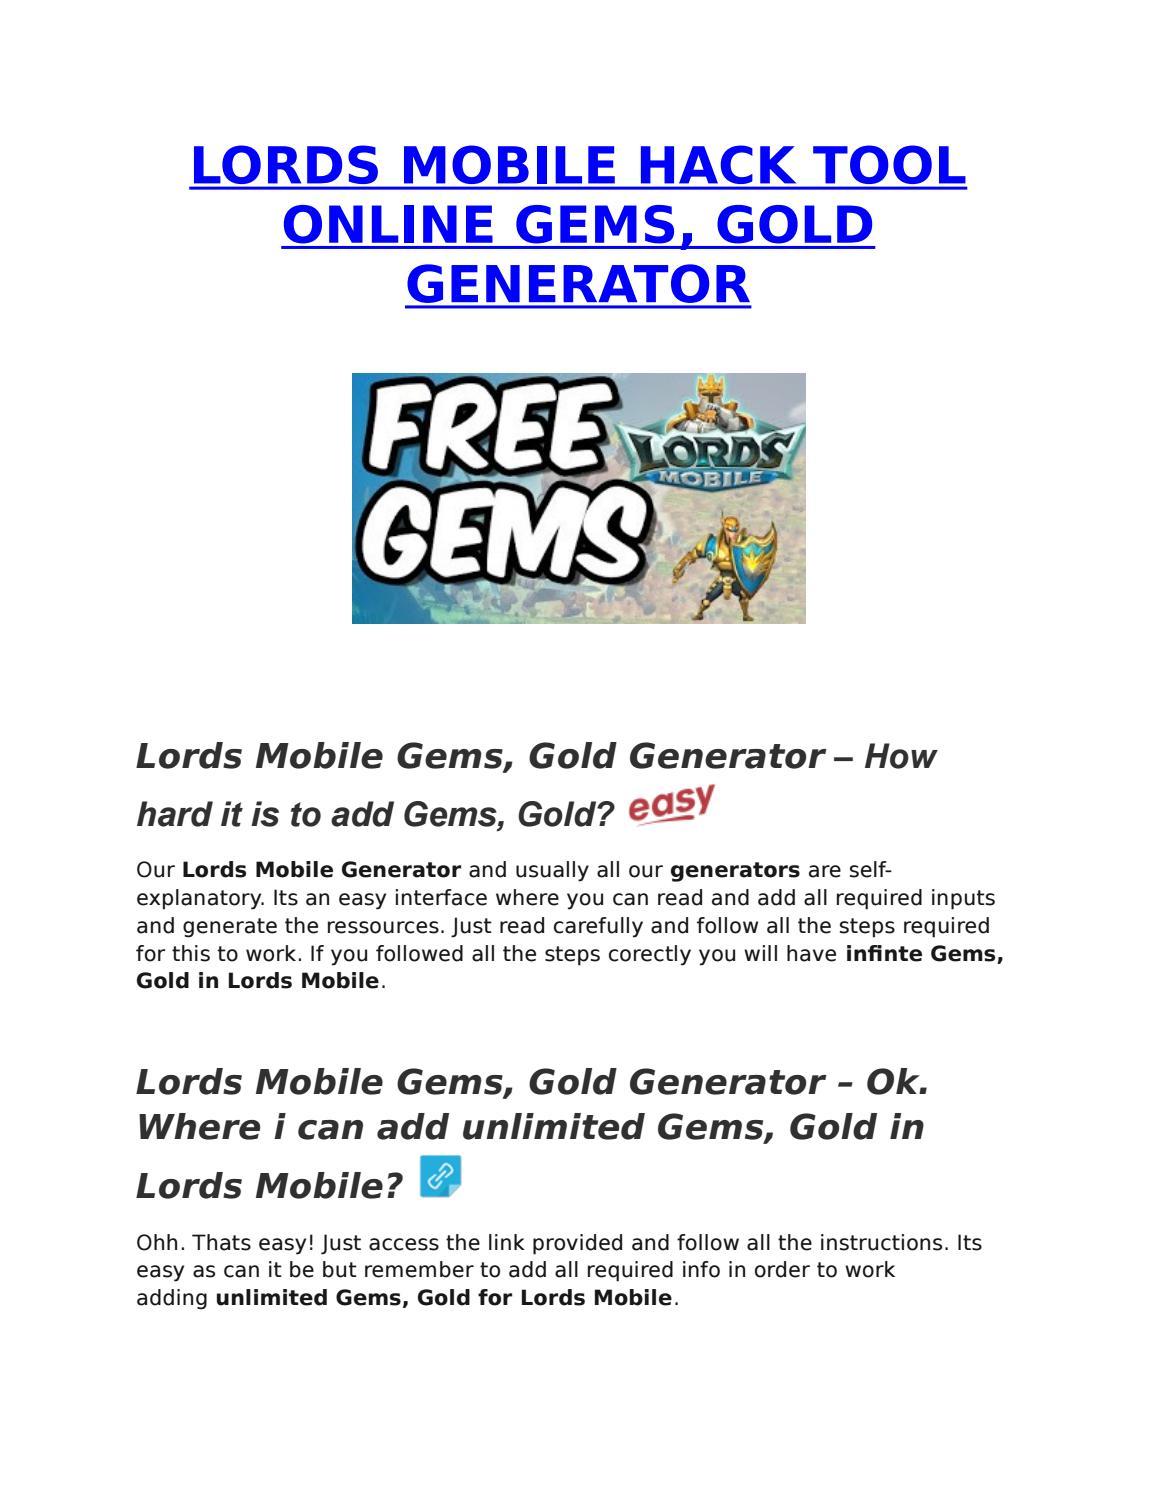 Lords Mobile Hack Gems Gold Generator By Jasmine Fabiana Issuu